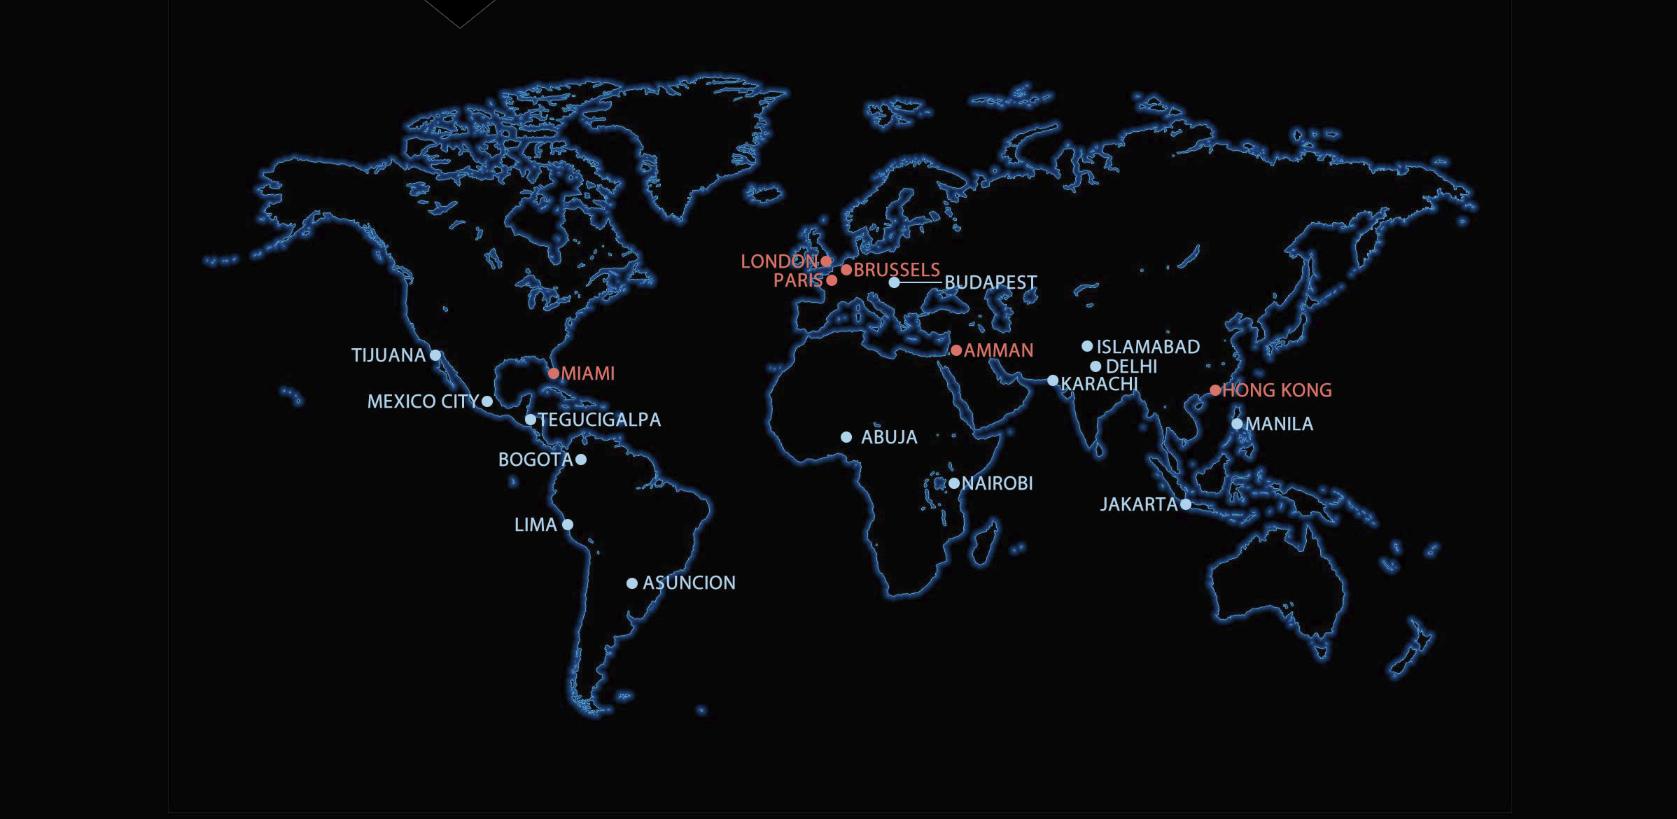 Interactive world map image